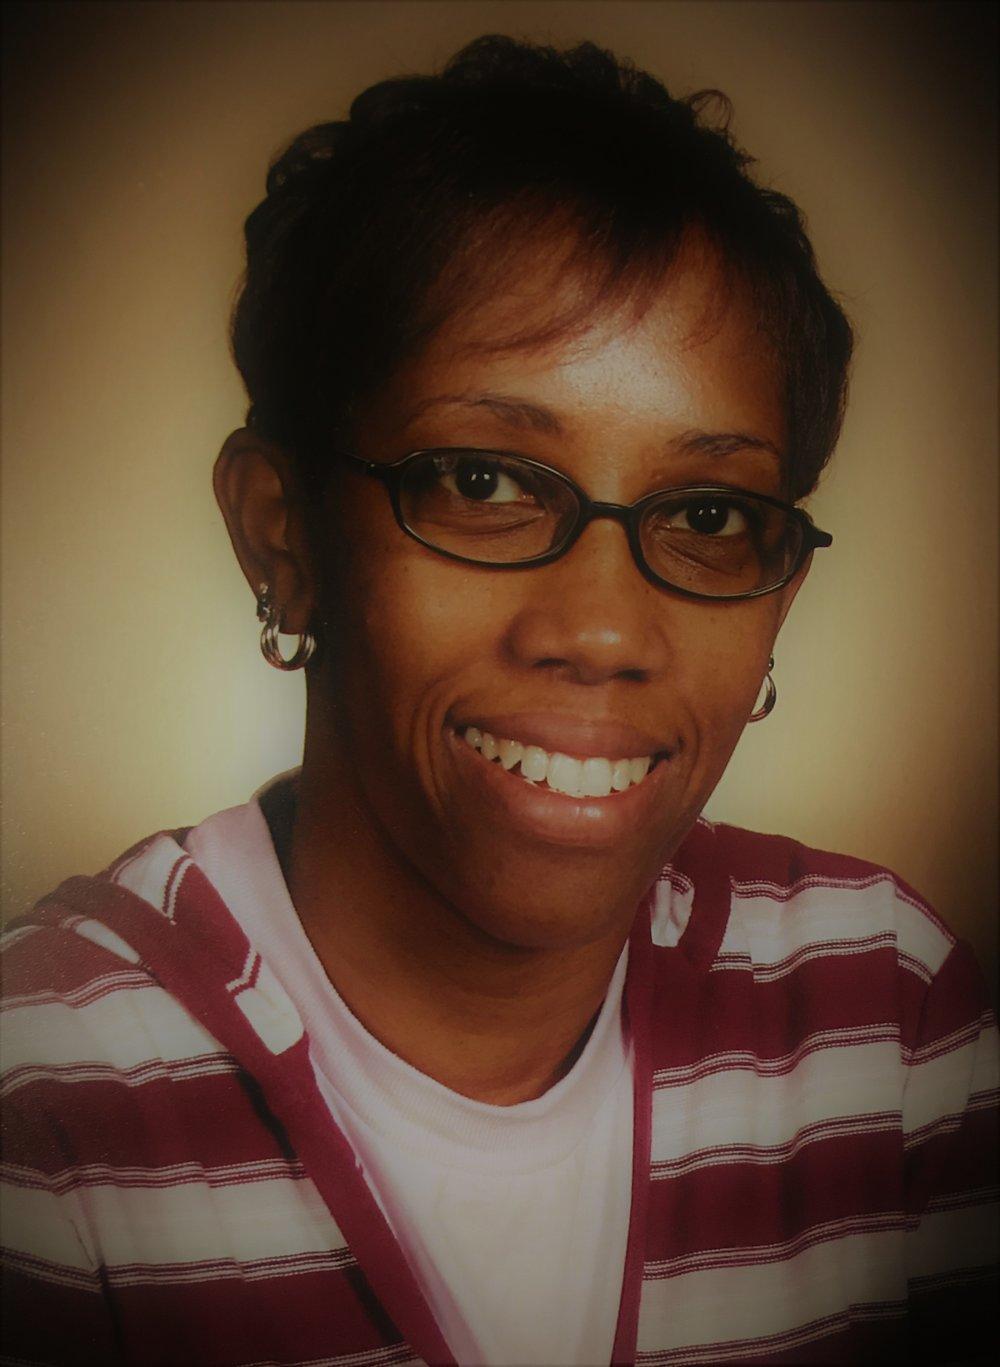 Lisa K. Stockton, mother of Indy/Ed writer Shawnta S. Barnes